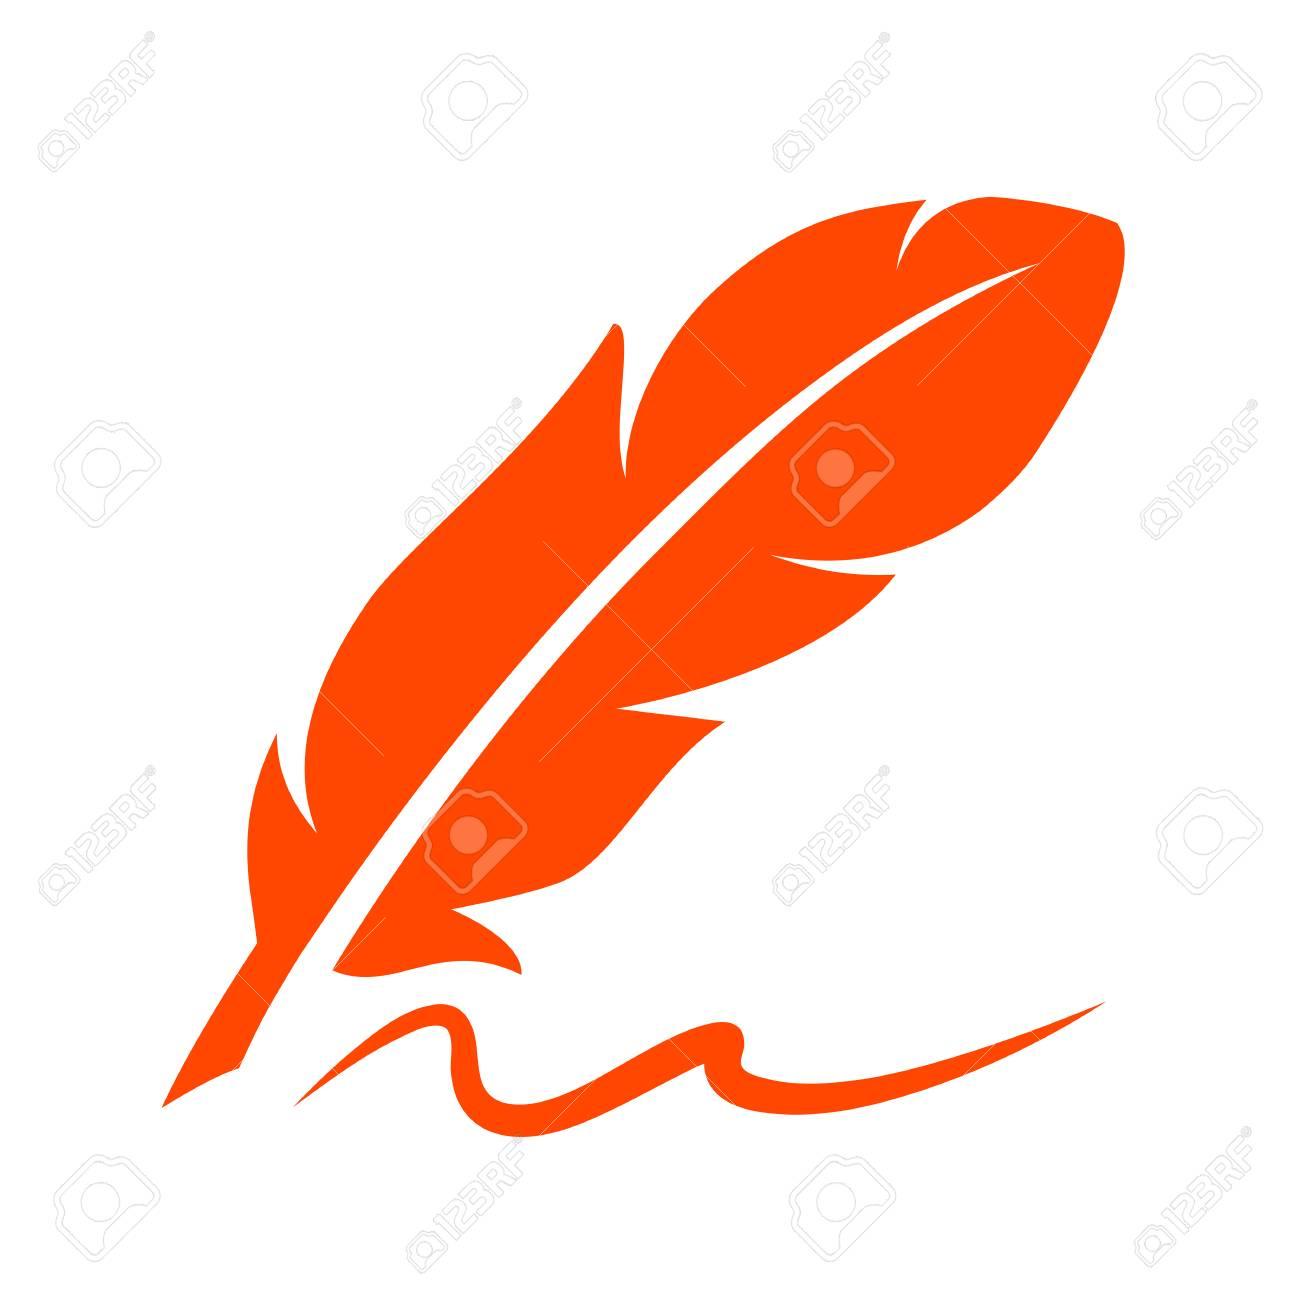 Retro writing pen icon on white background, vector illustration. - 91032263